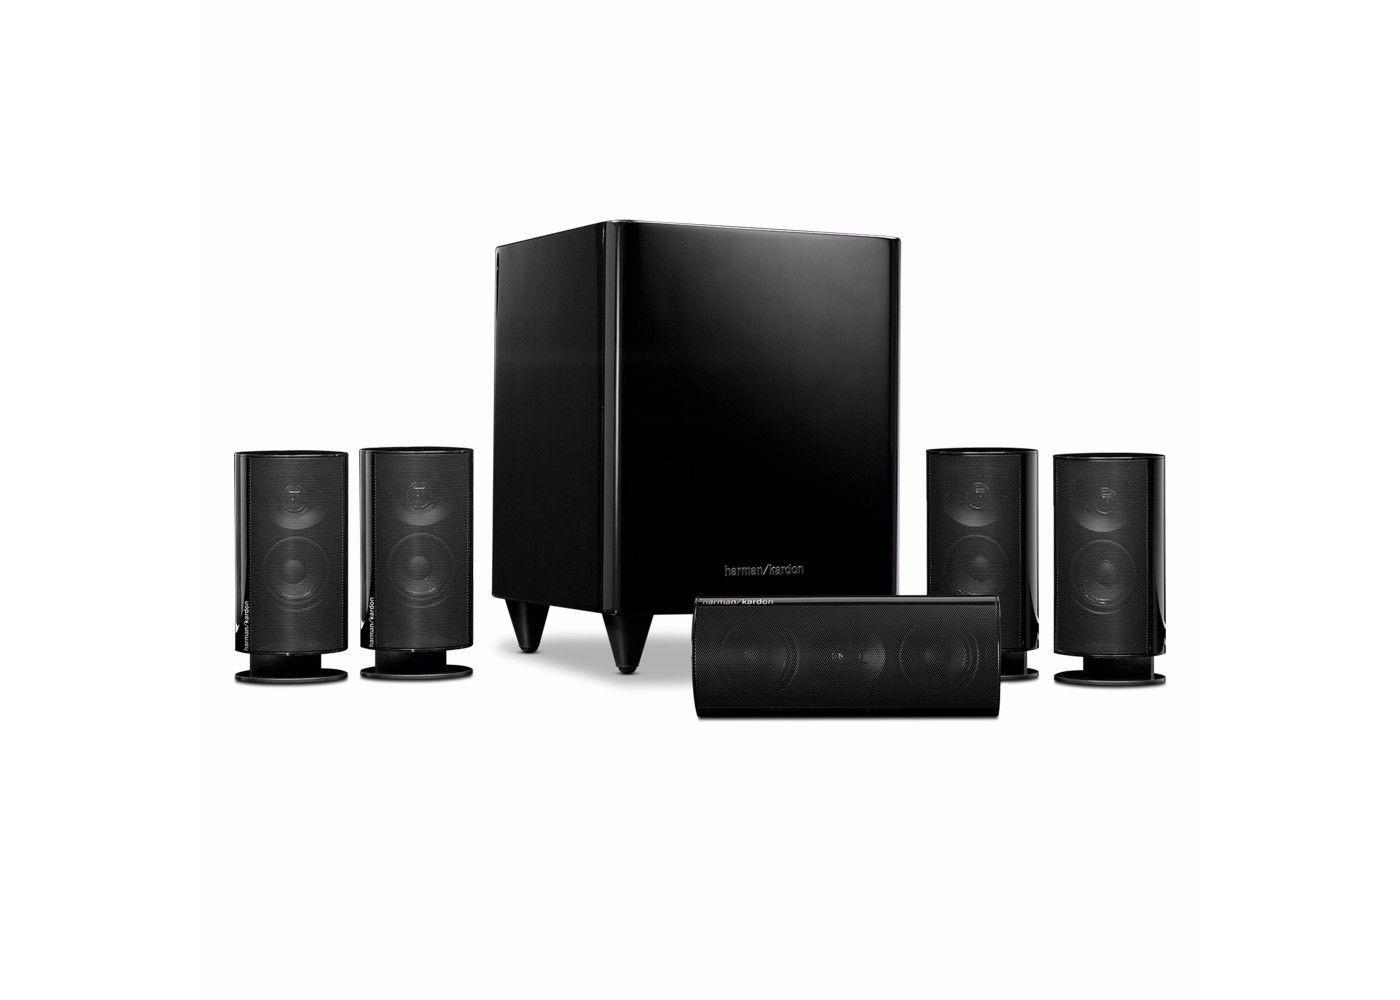 harman kardon hkts 20bq 5 1 home theater speaker system. Black Bedroom Furniture Sets. Home Design Ideas